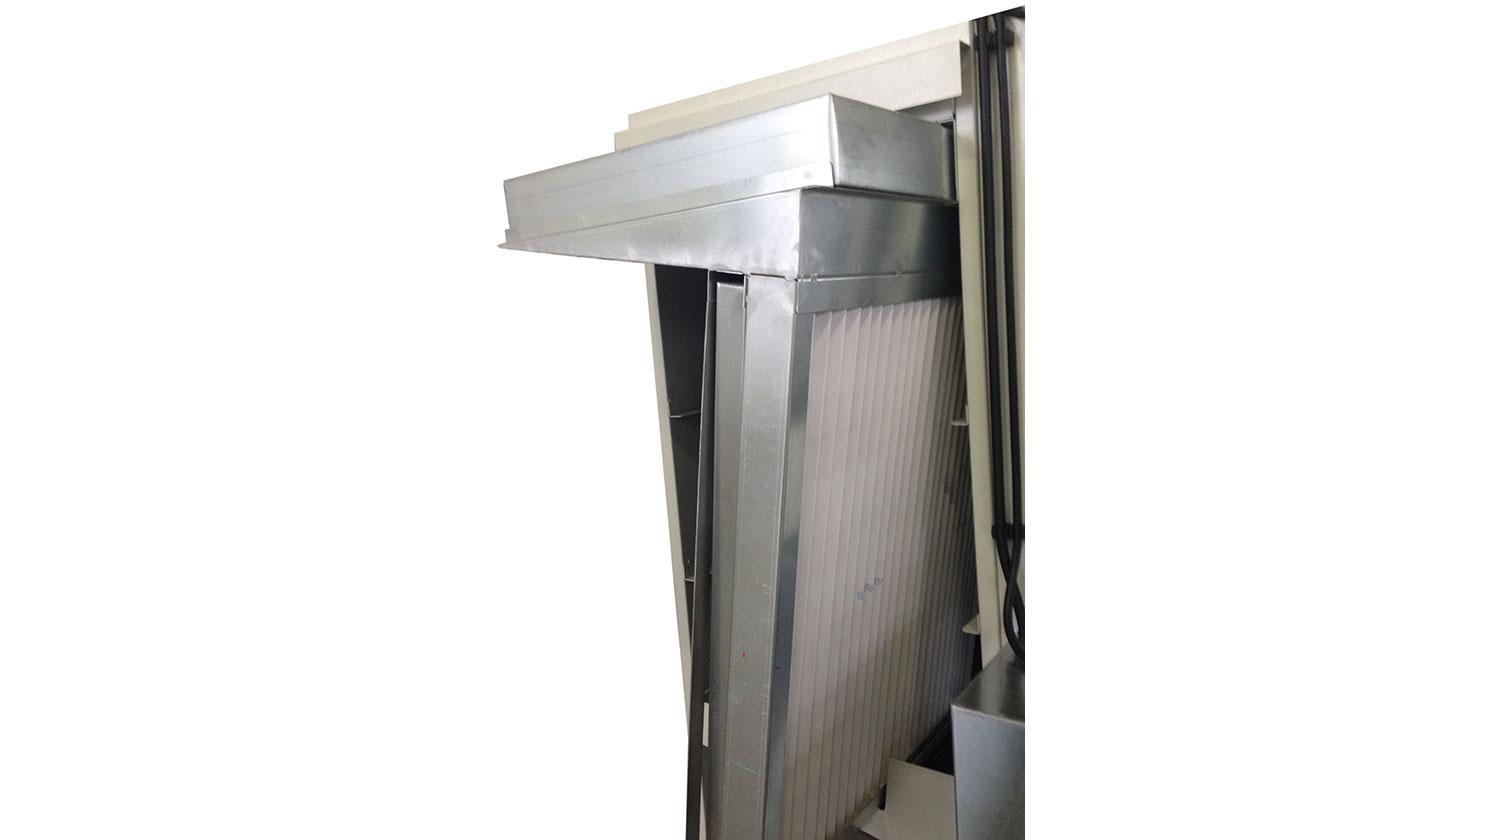 INT pvc windows paint line Giardina 1VE Eco filters